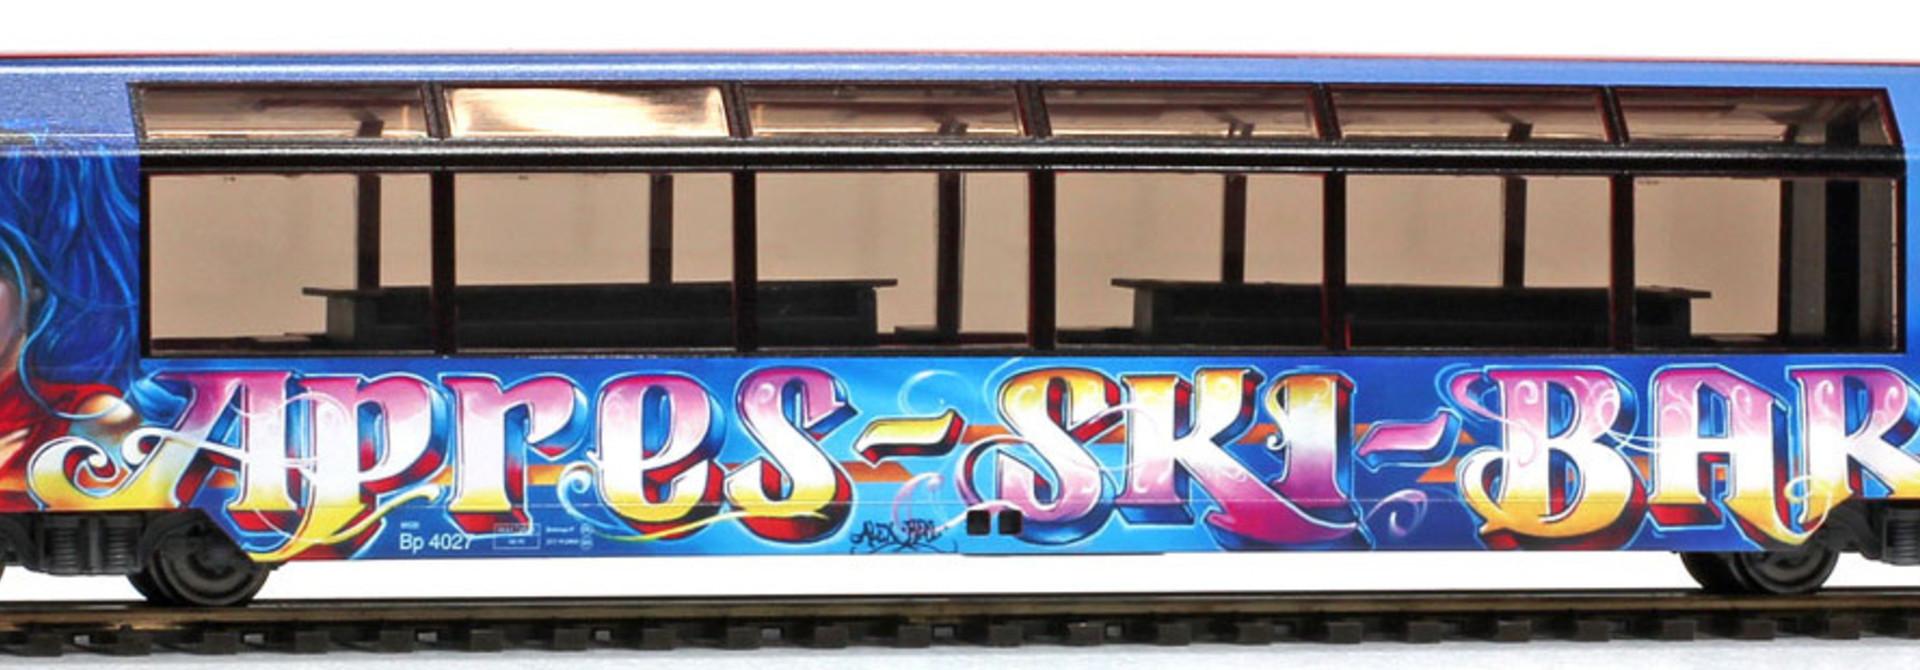 "3288297 MGB Bp 4027 ""Aprés-Ski-Bar"" blau"